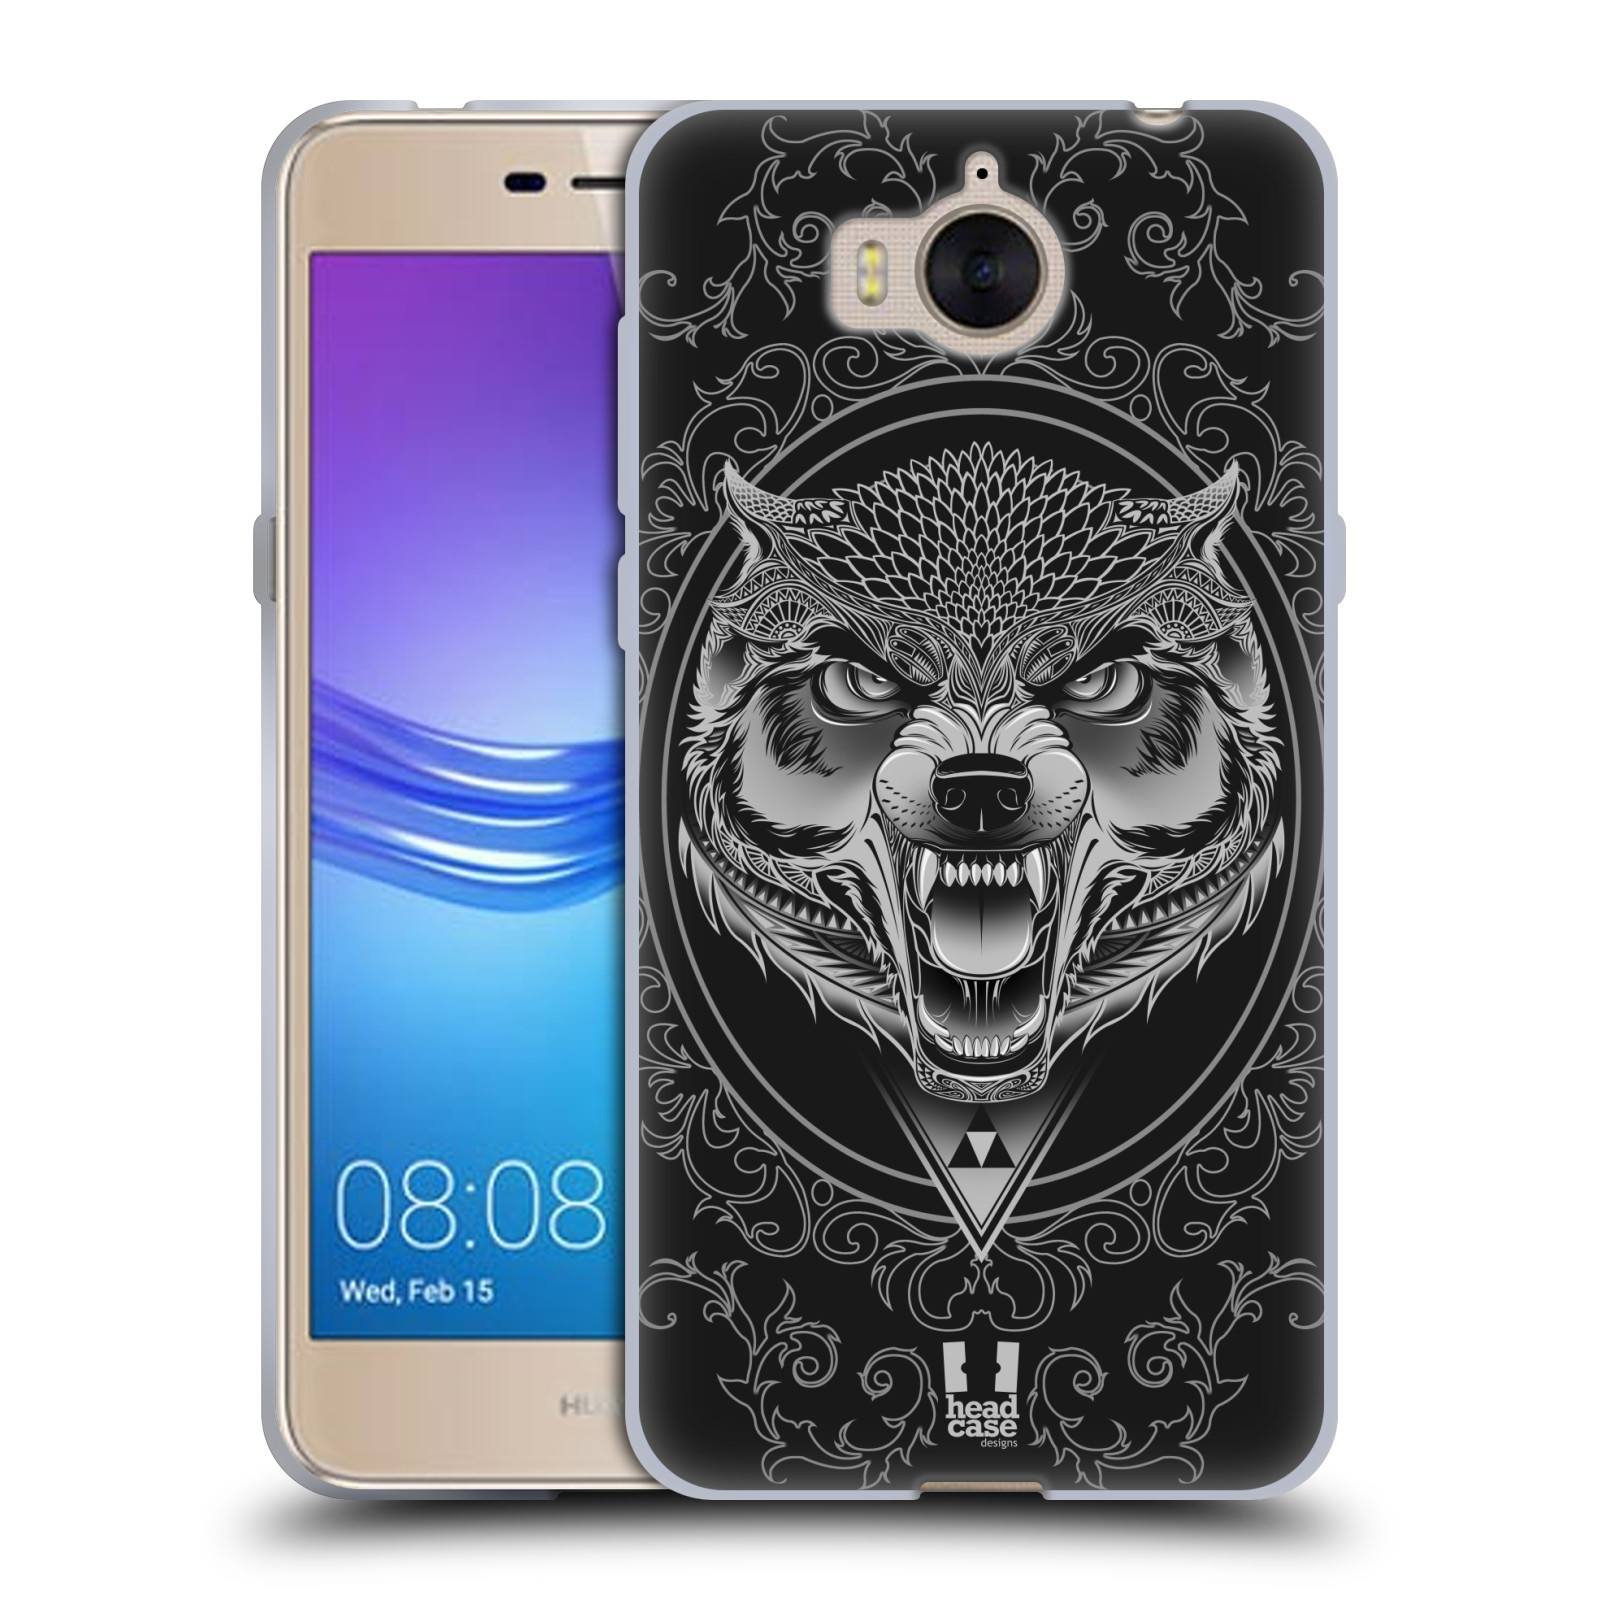 Silikonové pouzdro na mobil Huawei Y6 2017 - Head Case - Krutý vlk (Silikonový kryt či obal na mobilní telefon Huawei Y6 (2017) s motivem Krutý vlk)